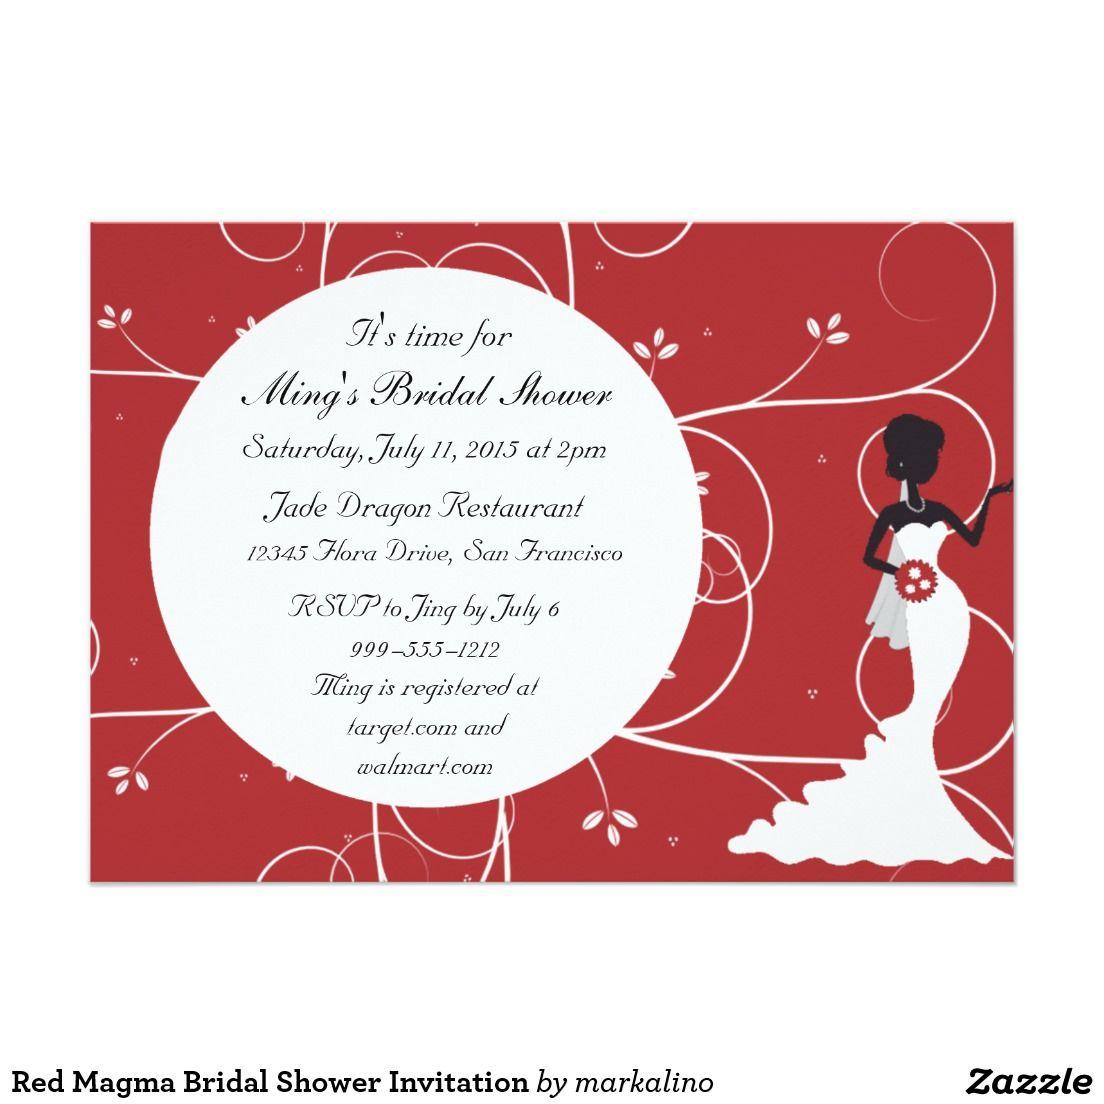 Fantastic Unique Bridal Shower Invites Composition - Invitations and ...